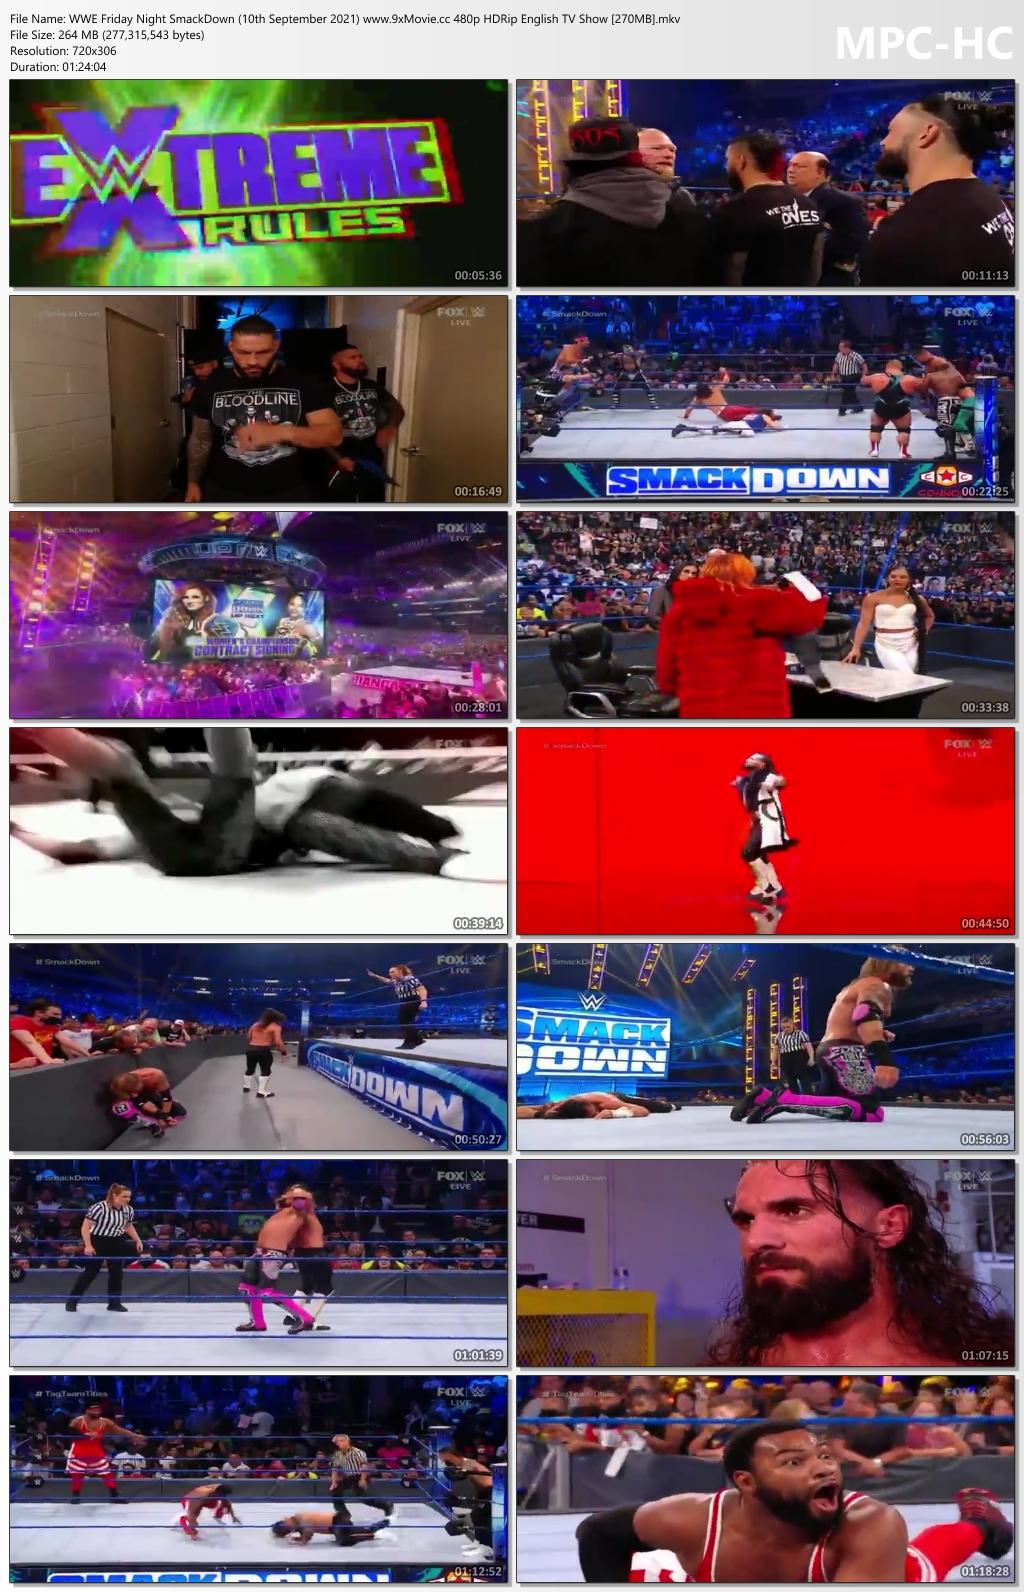 WWE-Friday-Night-Smack-Down-10th-September-2021-www-9x-Movie-cc-480p-HDRip-English-TV-Show-270-MB-mk